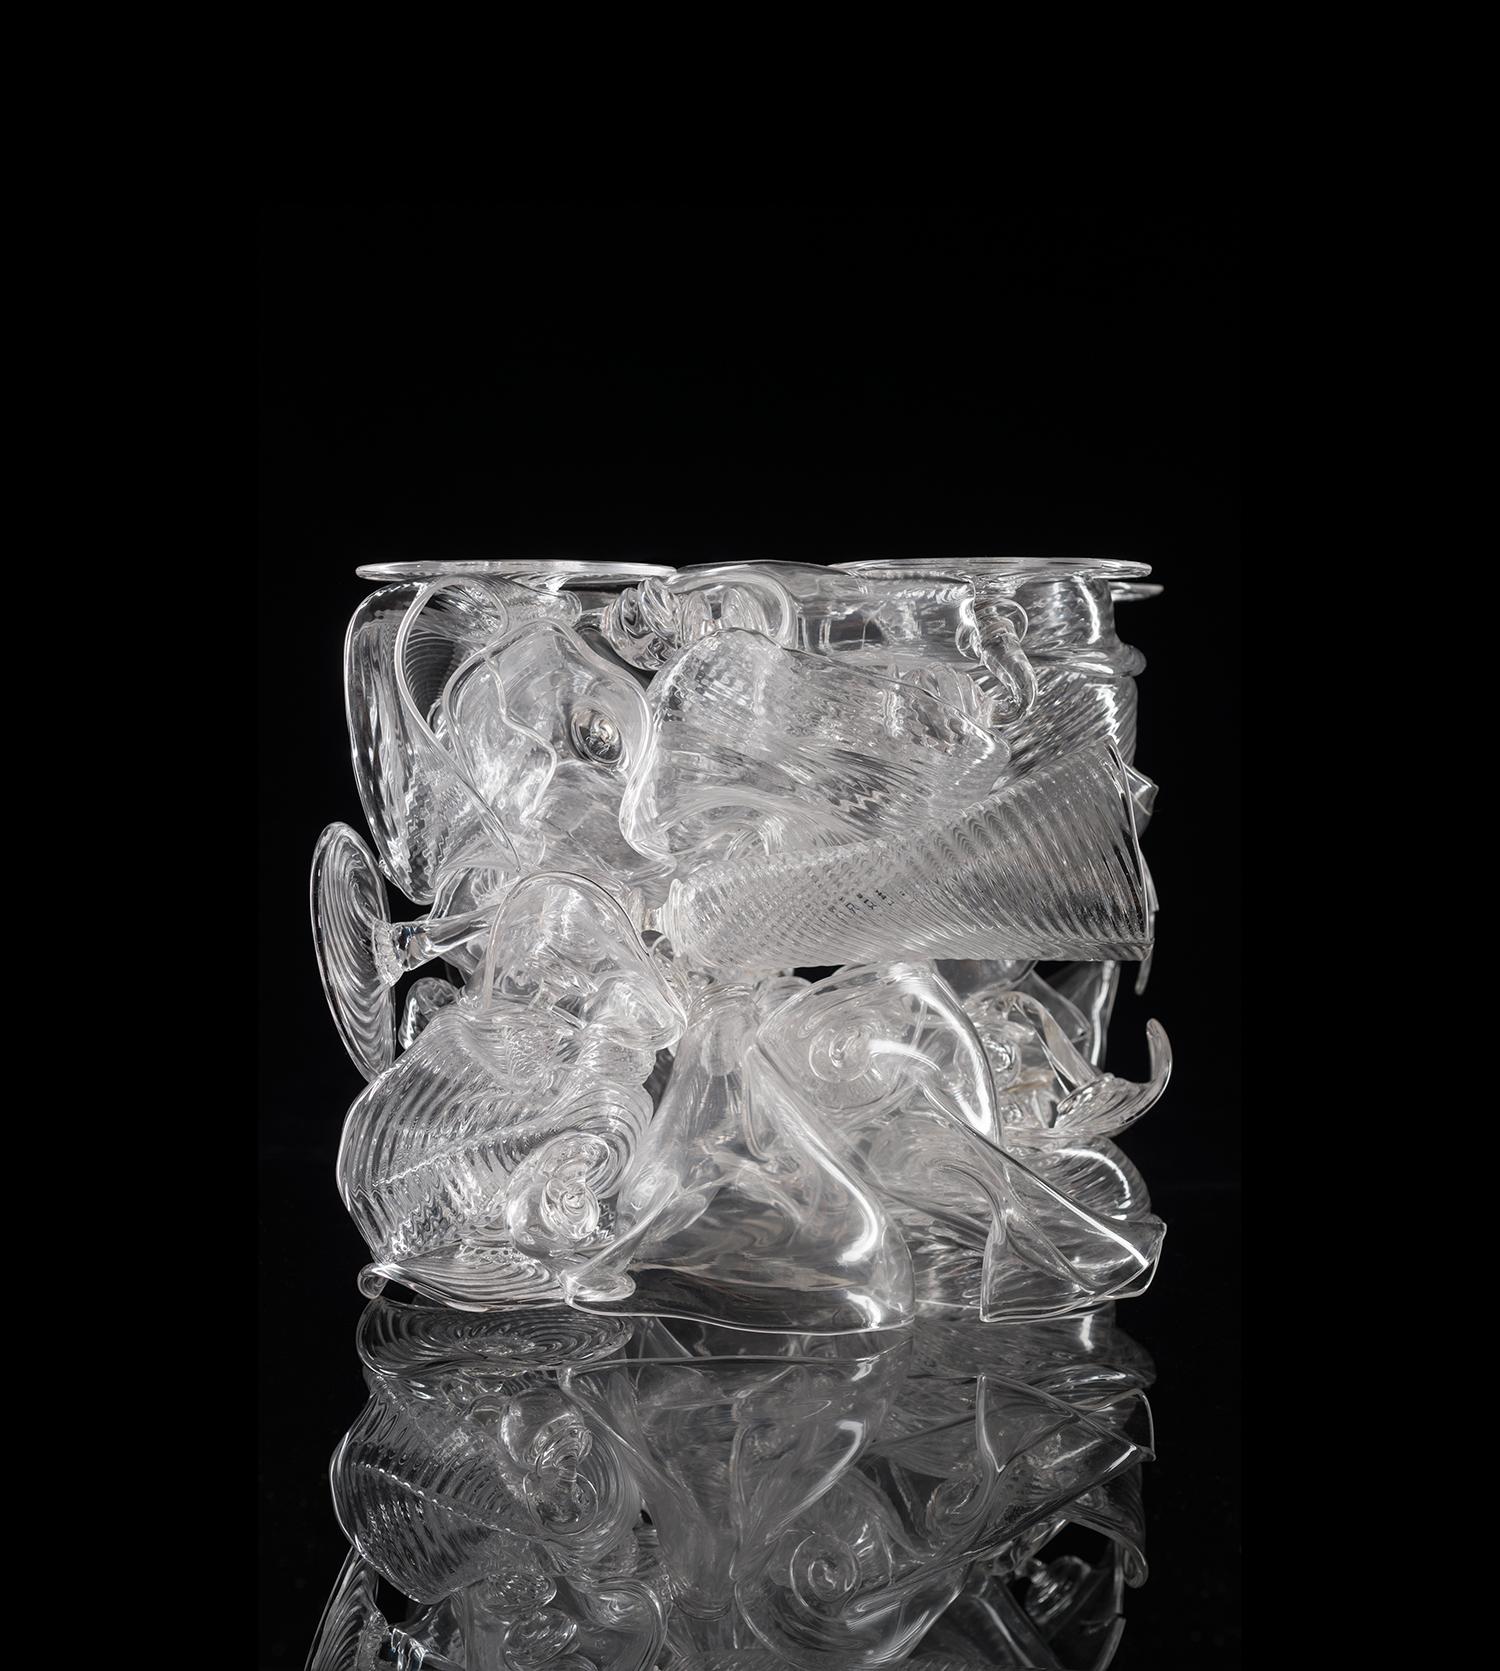 A small but intricate glass sculpture